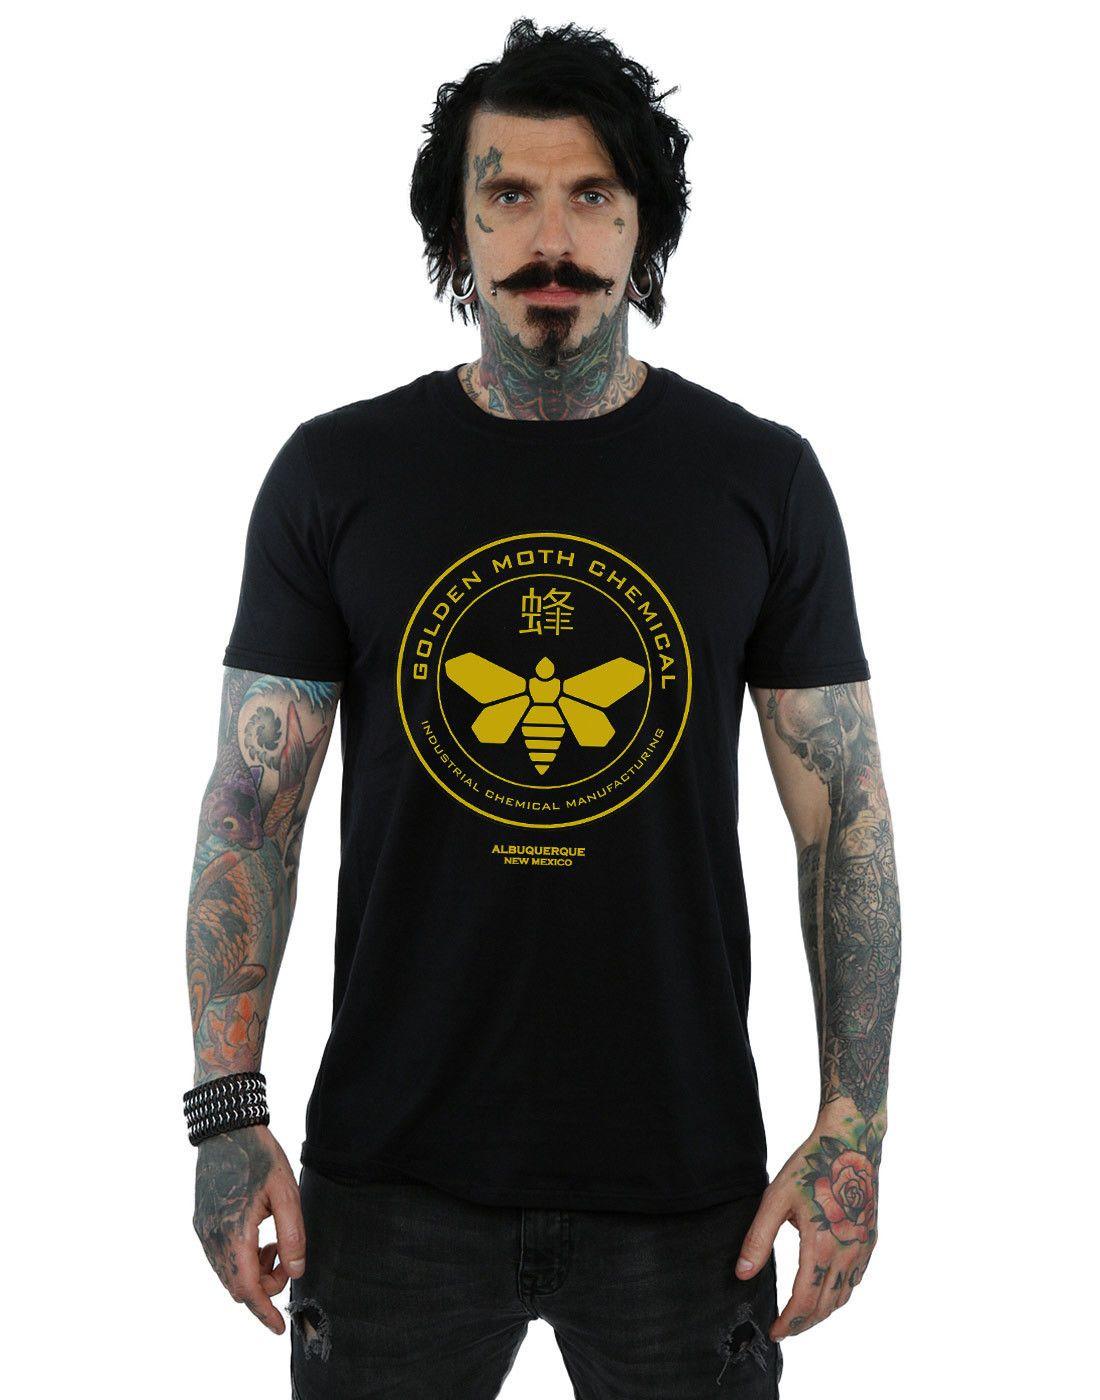 e5f009617 Compre Alex Chenery Hombres Golden Moth Camiseta 3D Hombres Hot Cheap Manga  Corta Camiseta Masculina A $11.48 Del Gaobei08 | DHgate.Com